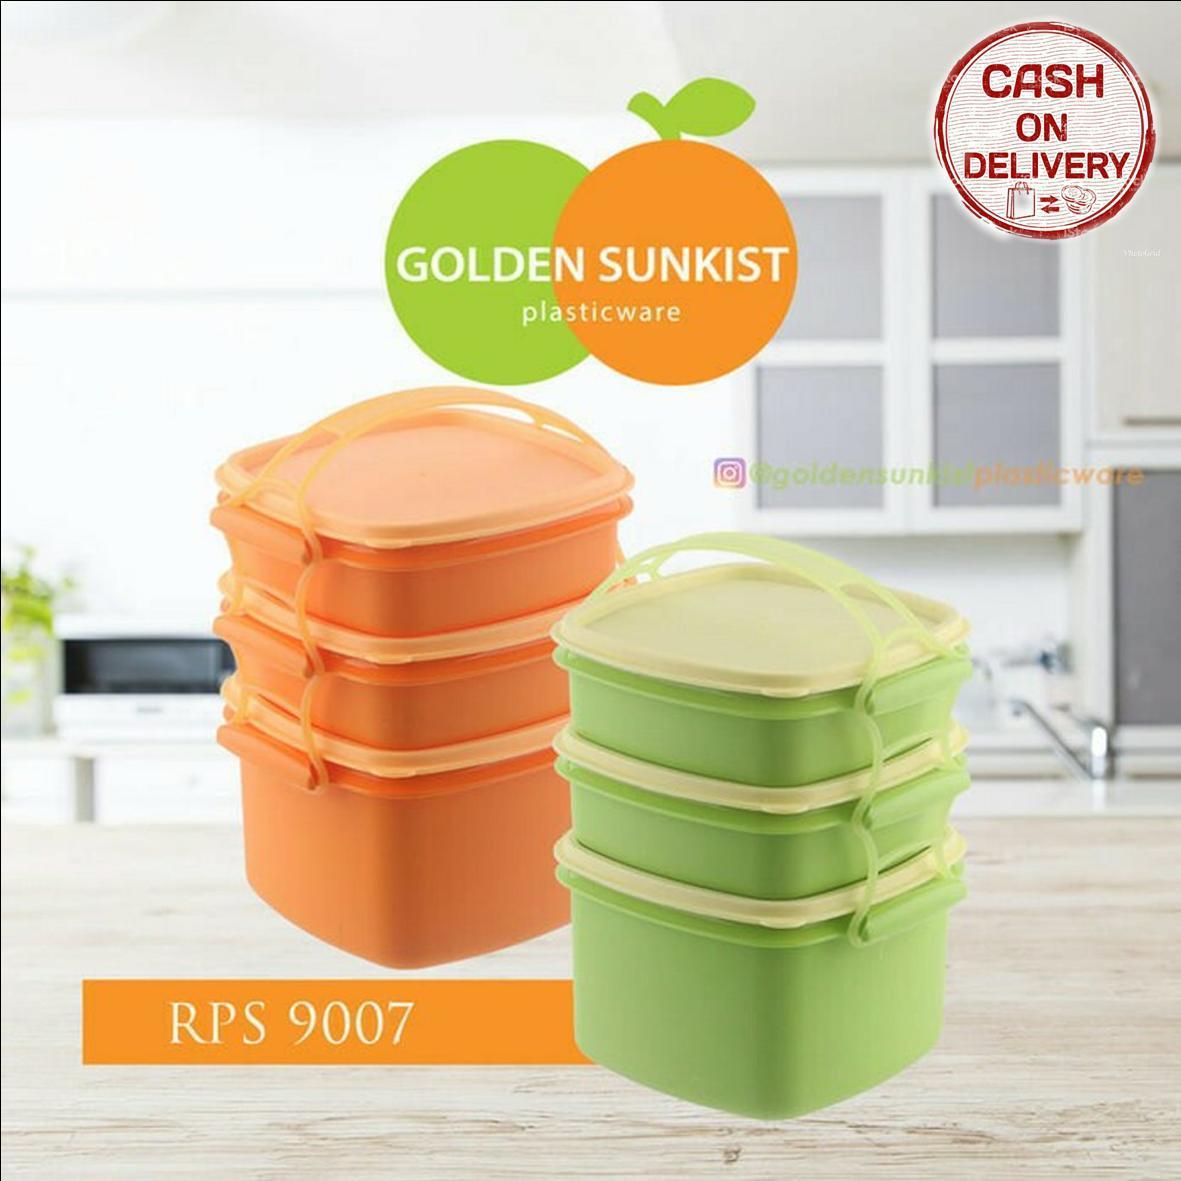 Kado Unik-- Rantang Piknik Food Grade Golden Sunkist Polos Susun 3 / Rantang Susun